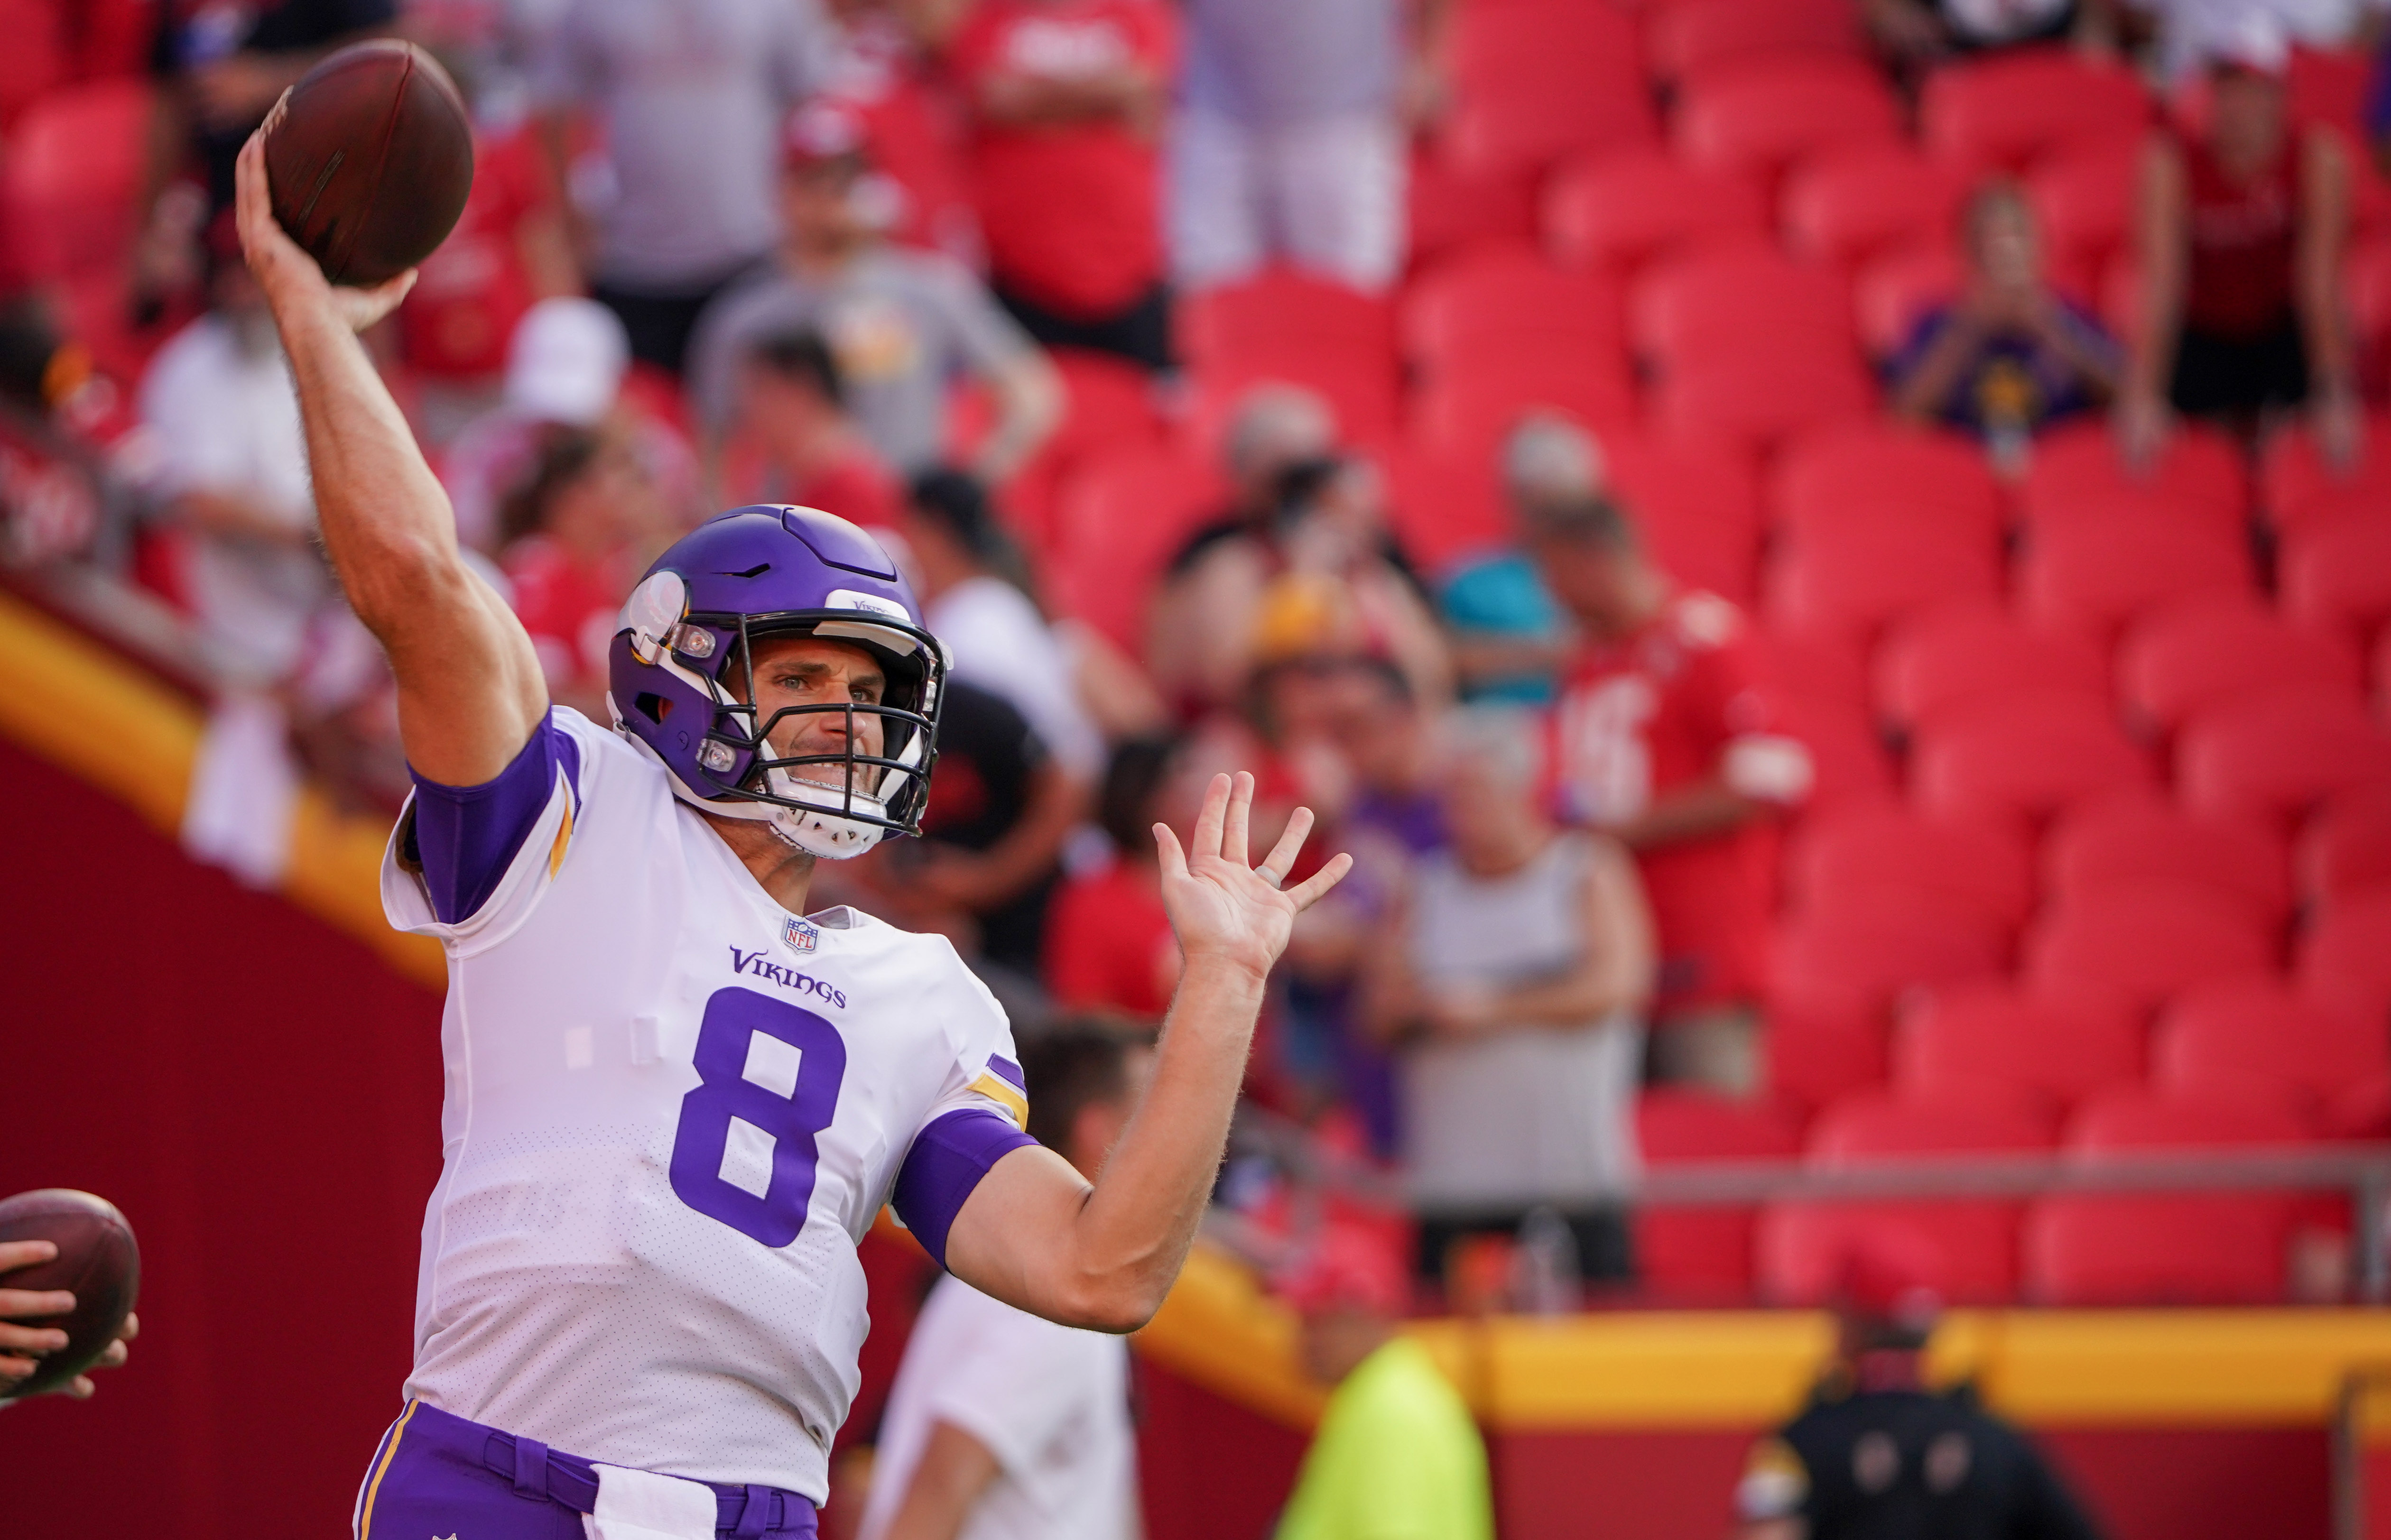 Minnesota Vikings quarterback Kirk Cousins (8) warms up against the Kansas City Chiefs before the game at GEHA Field at Arrowhead Stadium.